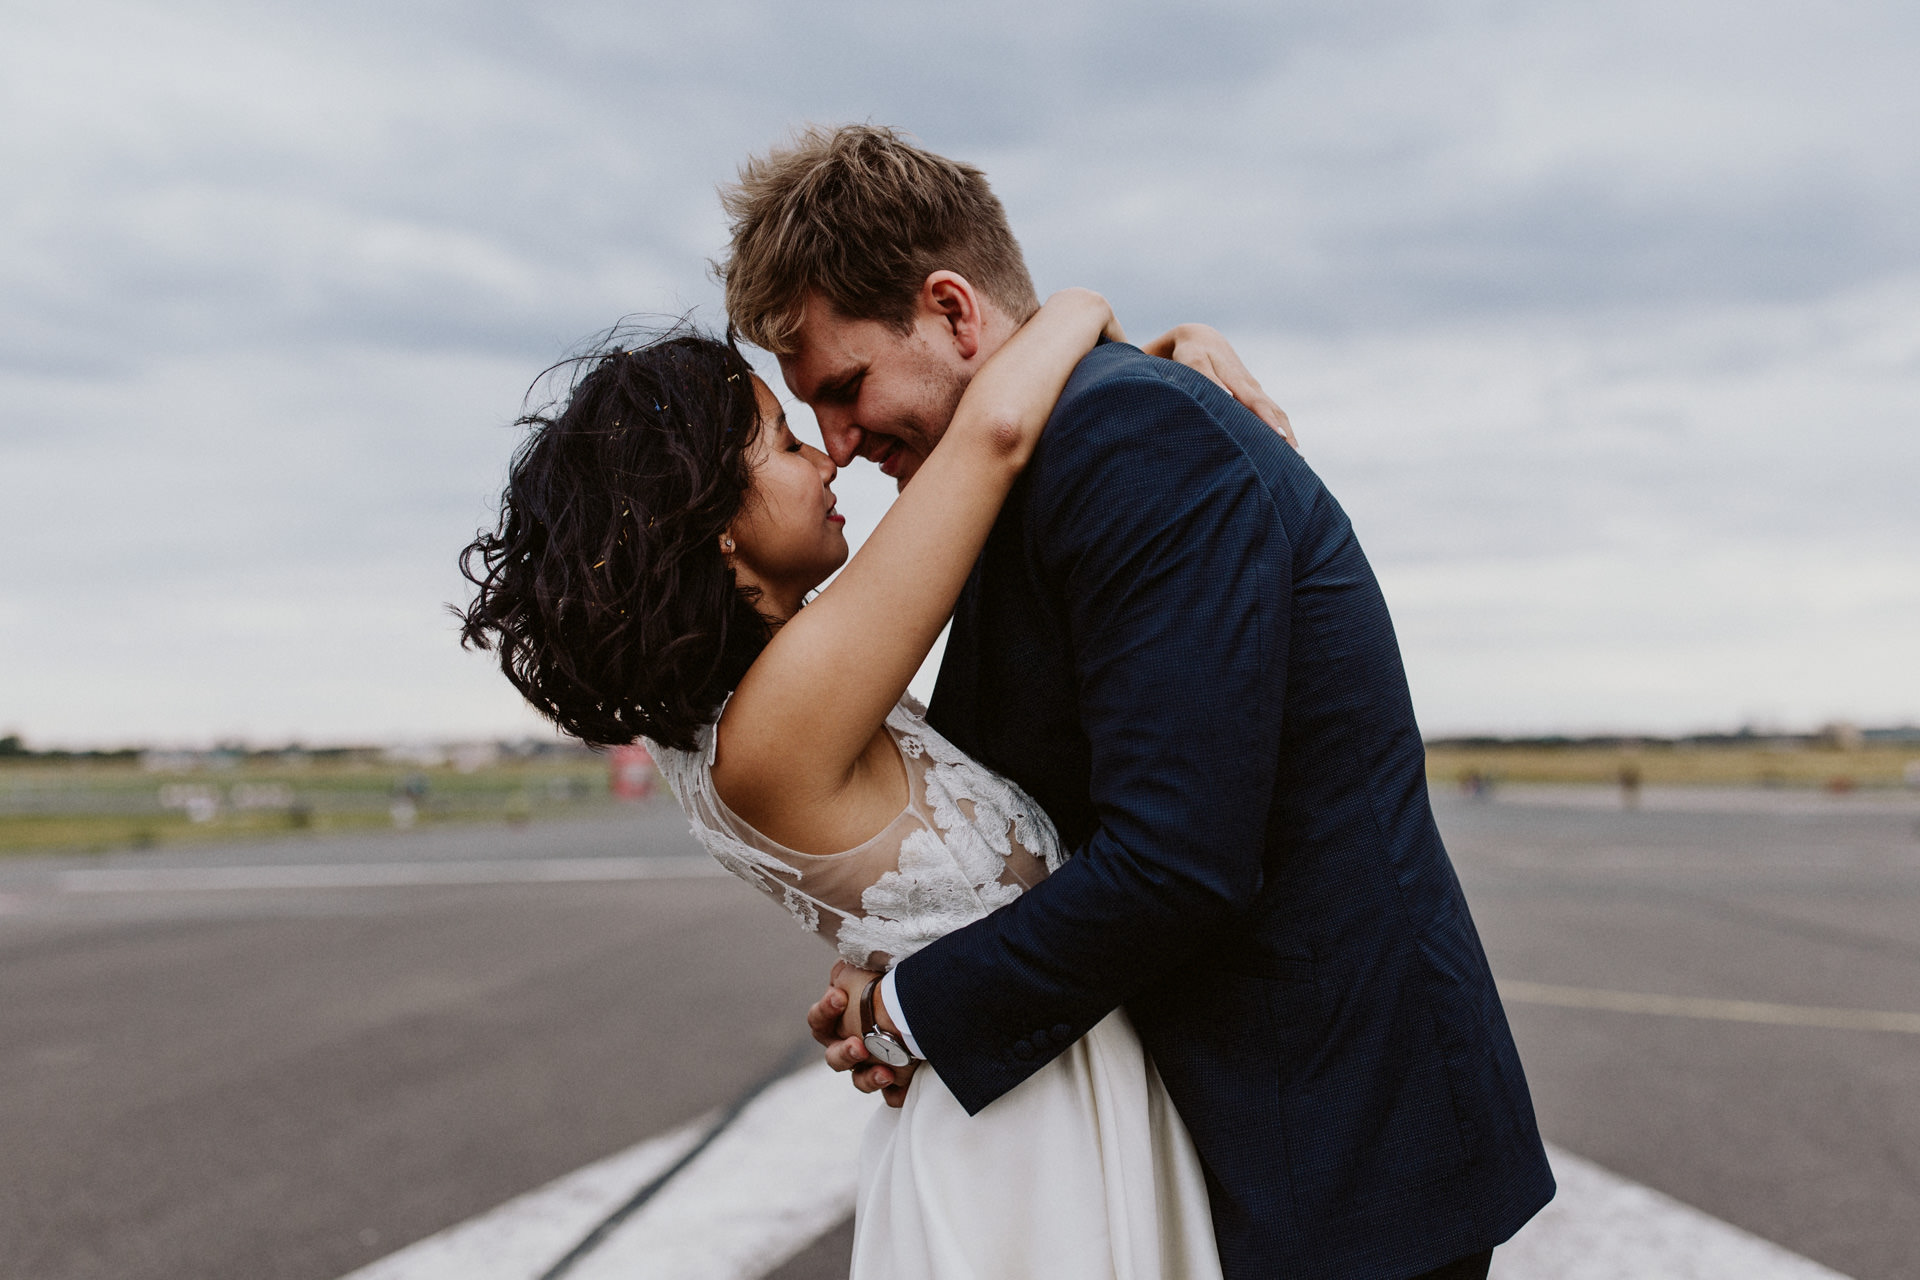 hochzeit brautpaar berlin neukölln heiraten